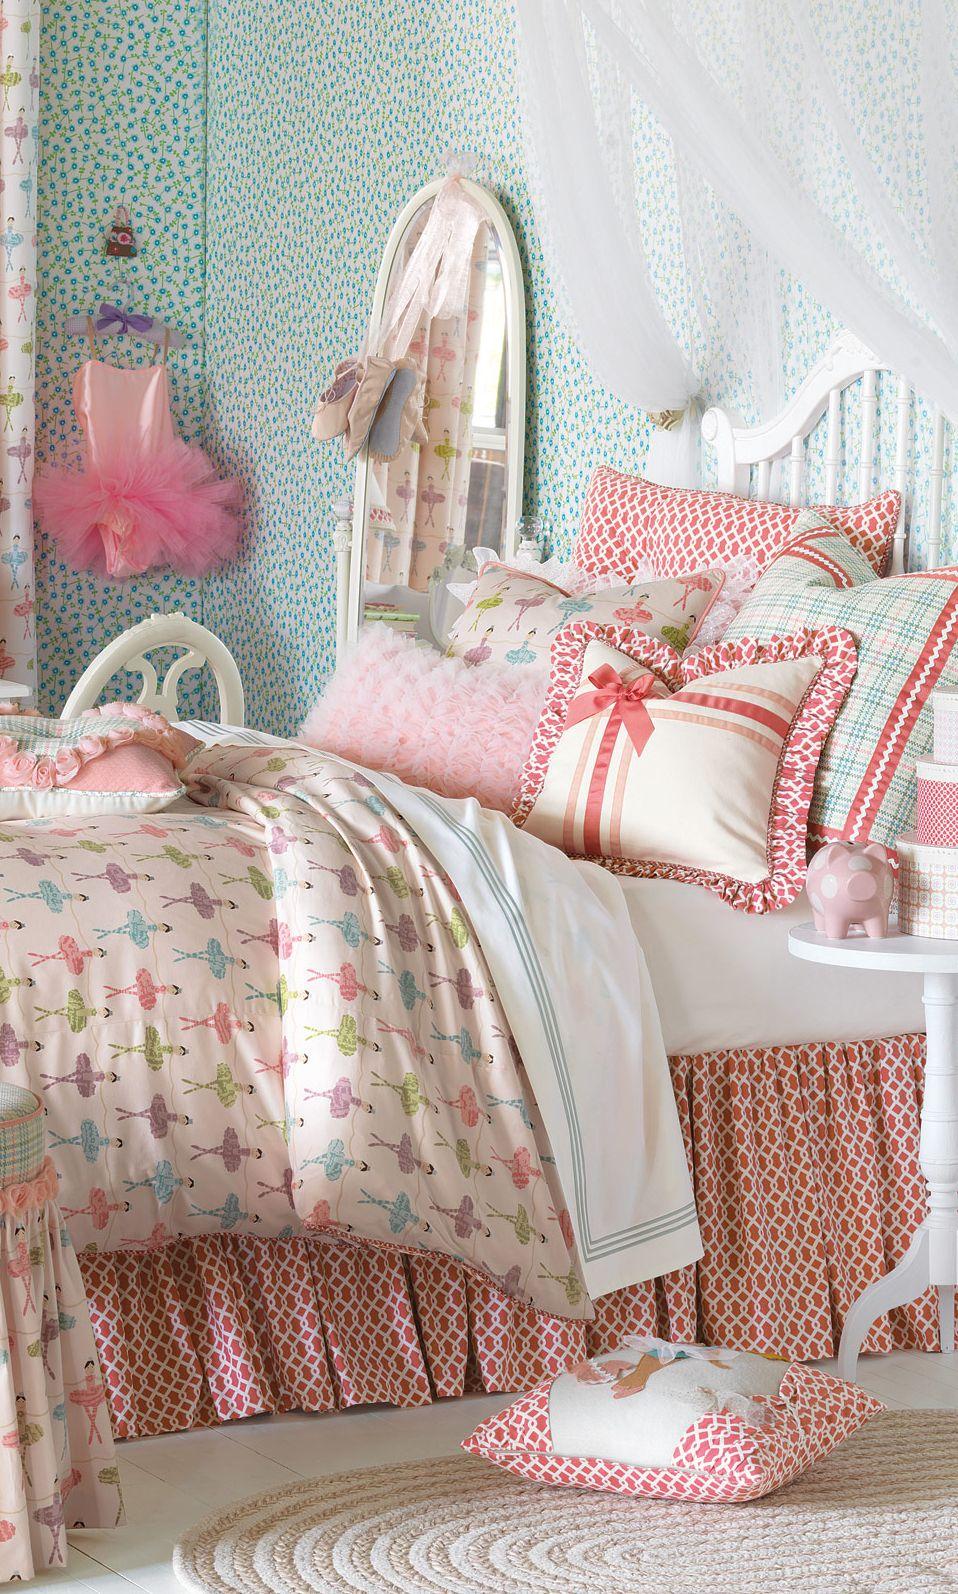 Girls Bedding Duvets Quilts Sheets Girls Ballerina Bedroom